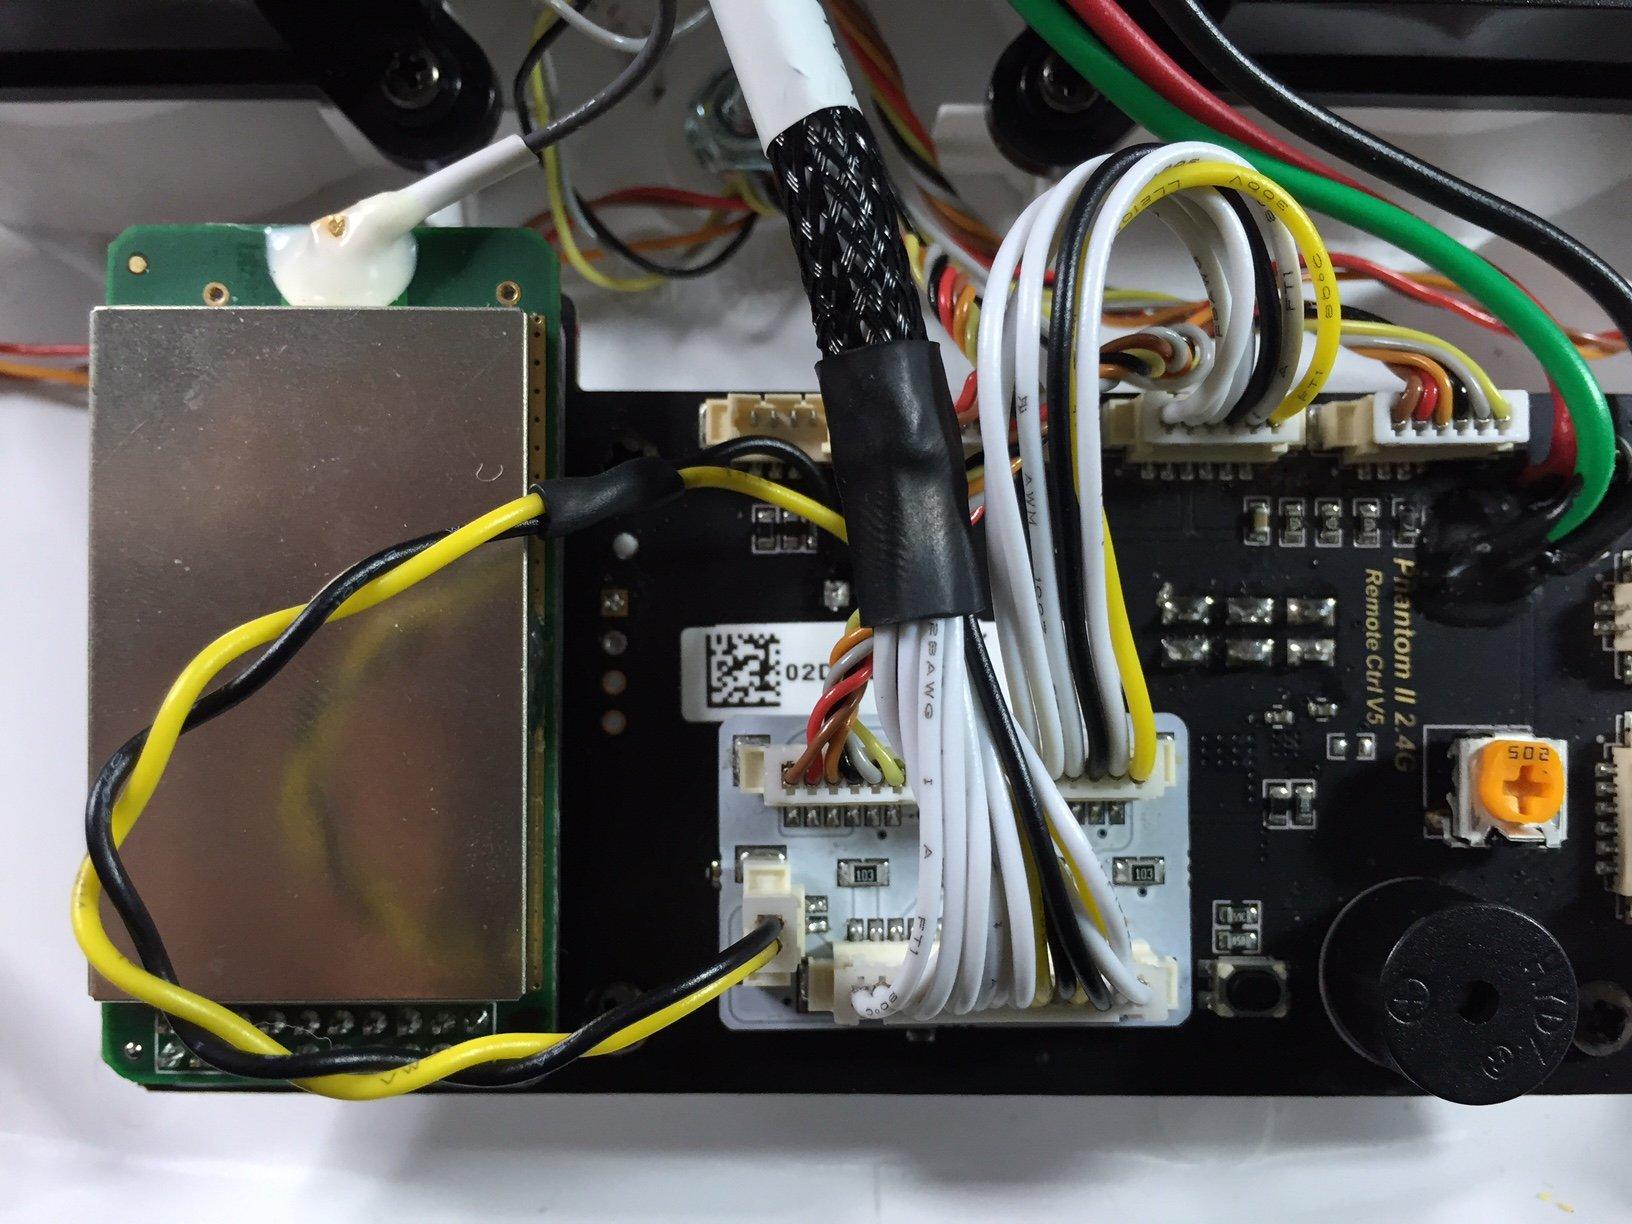 phantom dji f40 wiring diagram fe022 phantom dji f40 wiring diagram wiring resources  fe022 phantom dji f40 wiring diagram